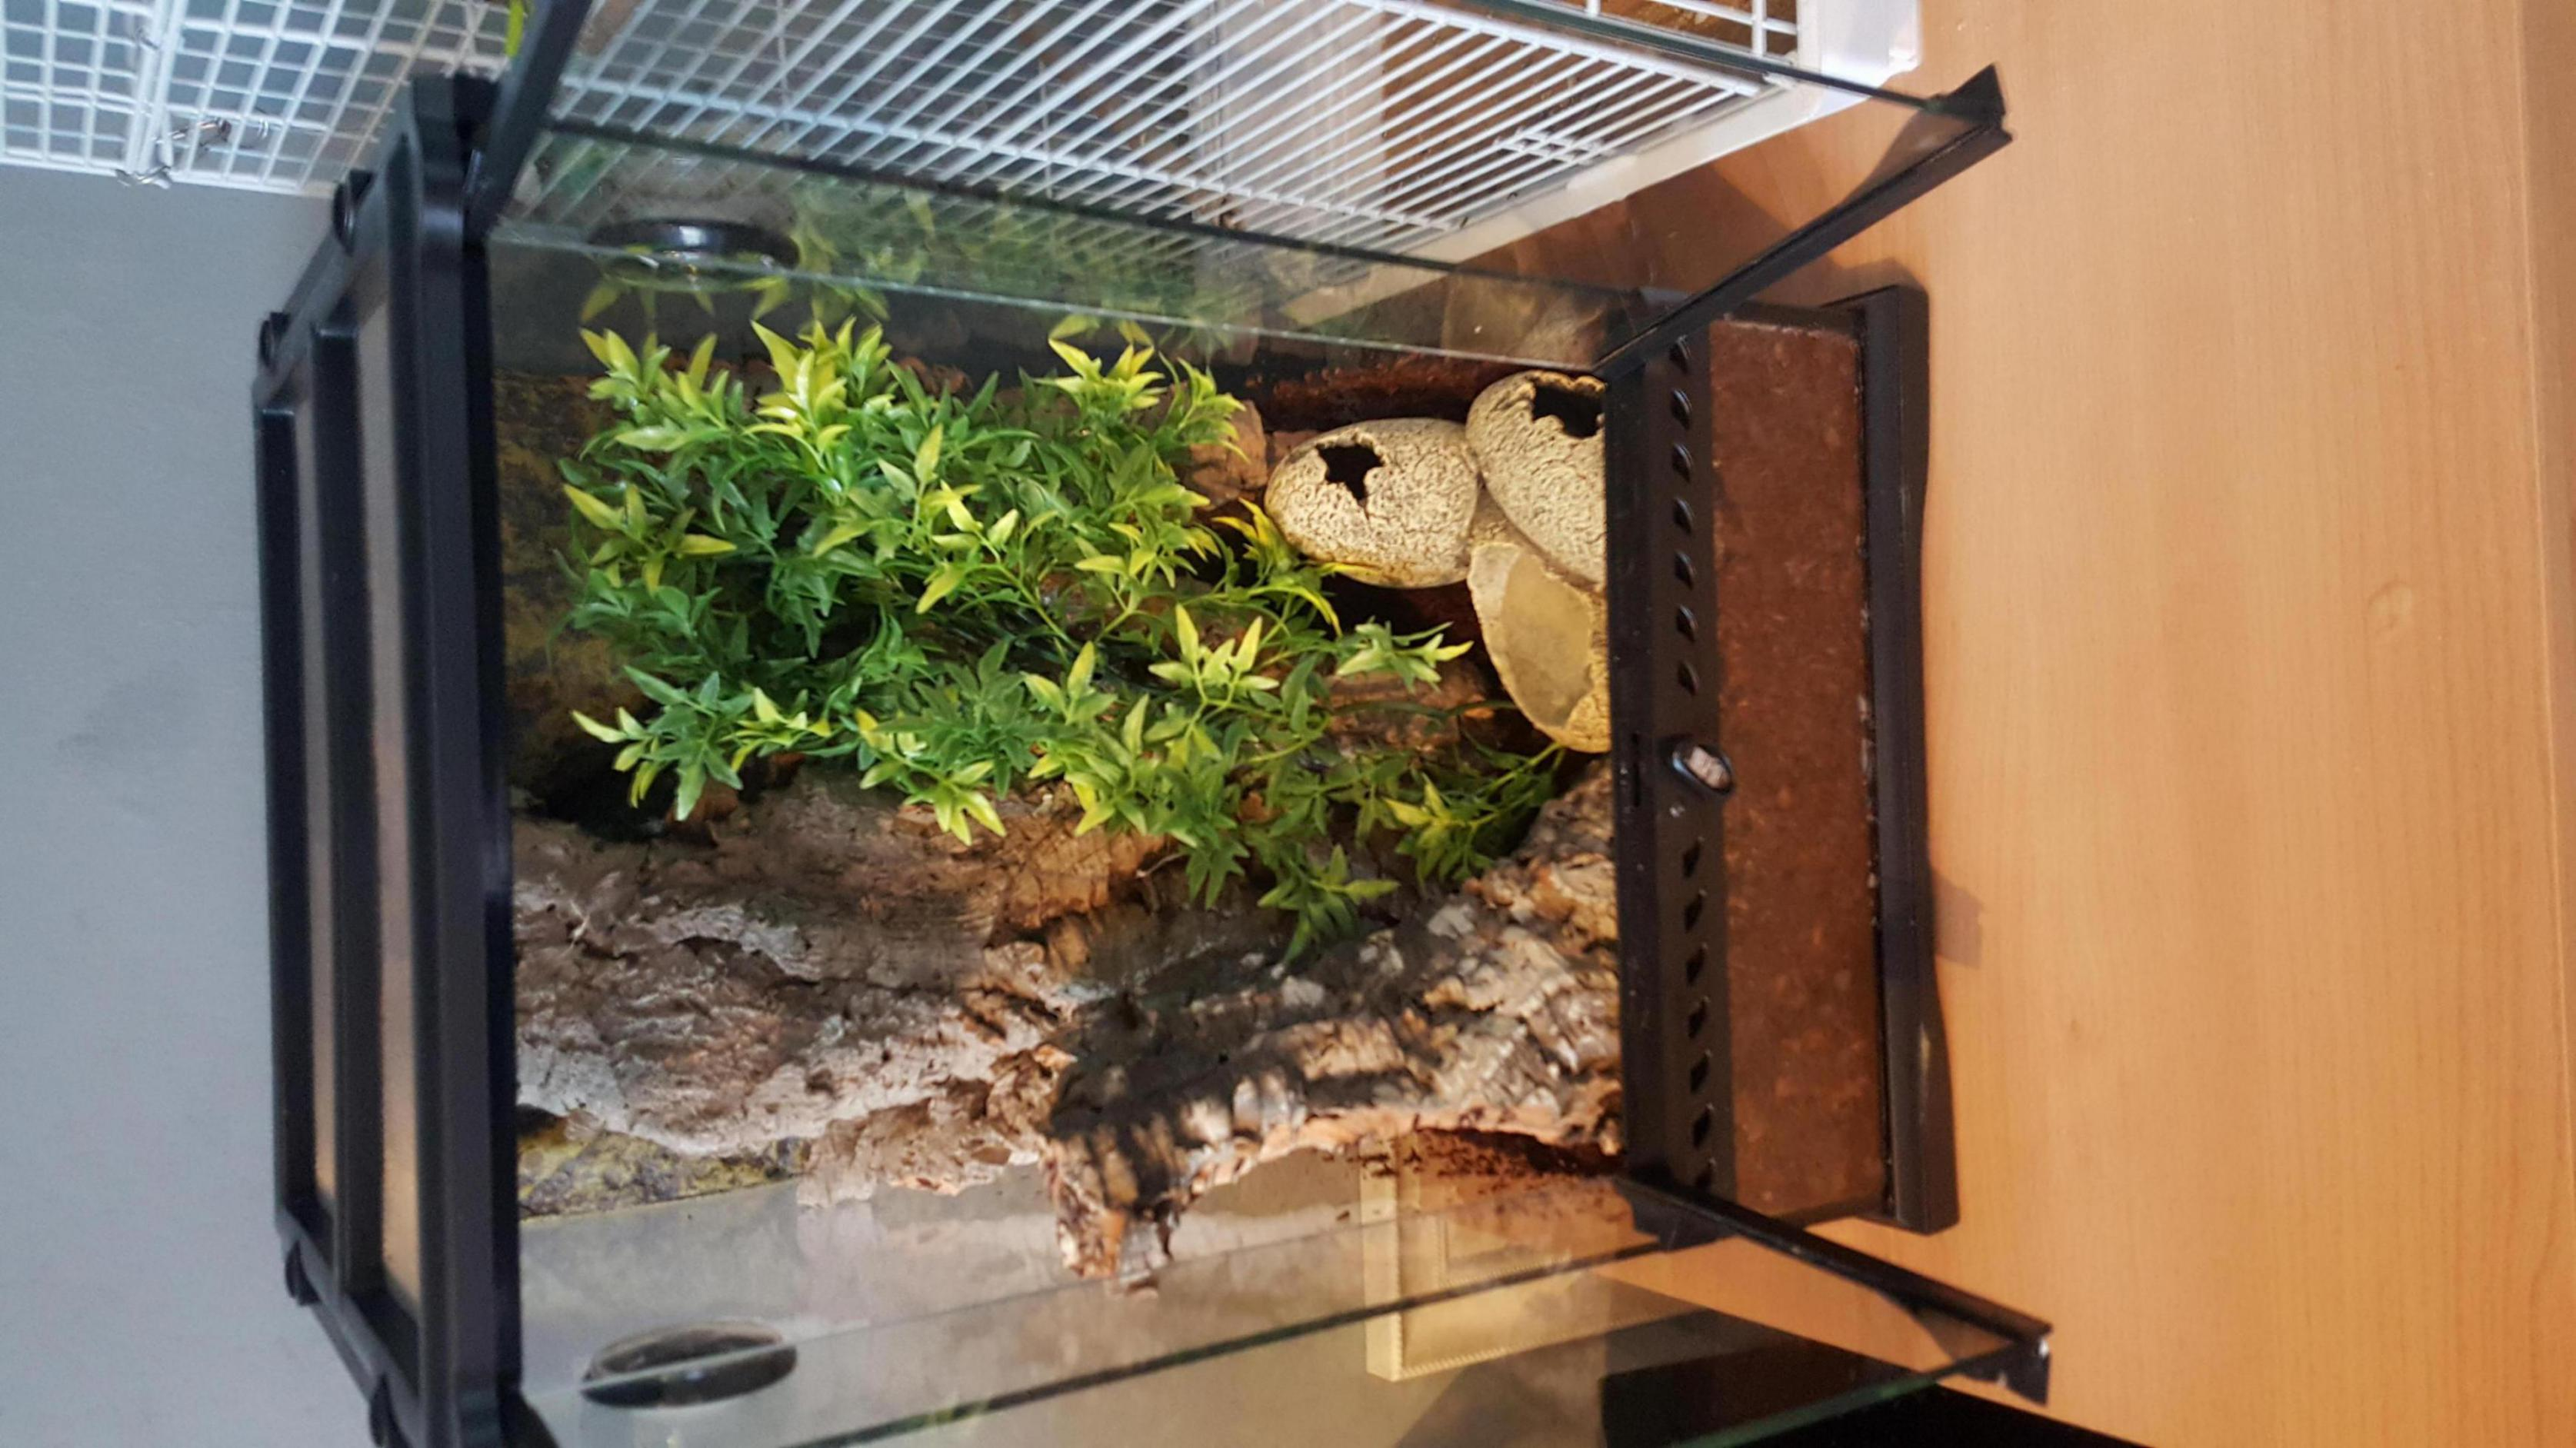 New Crested gecko-20180122_144549_1517089883480.jpg